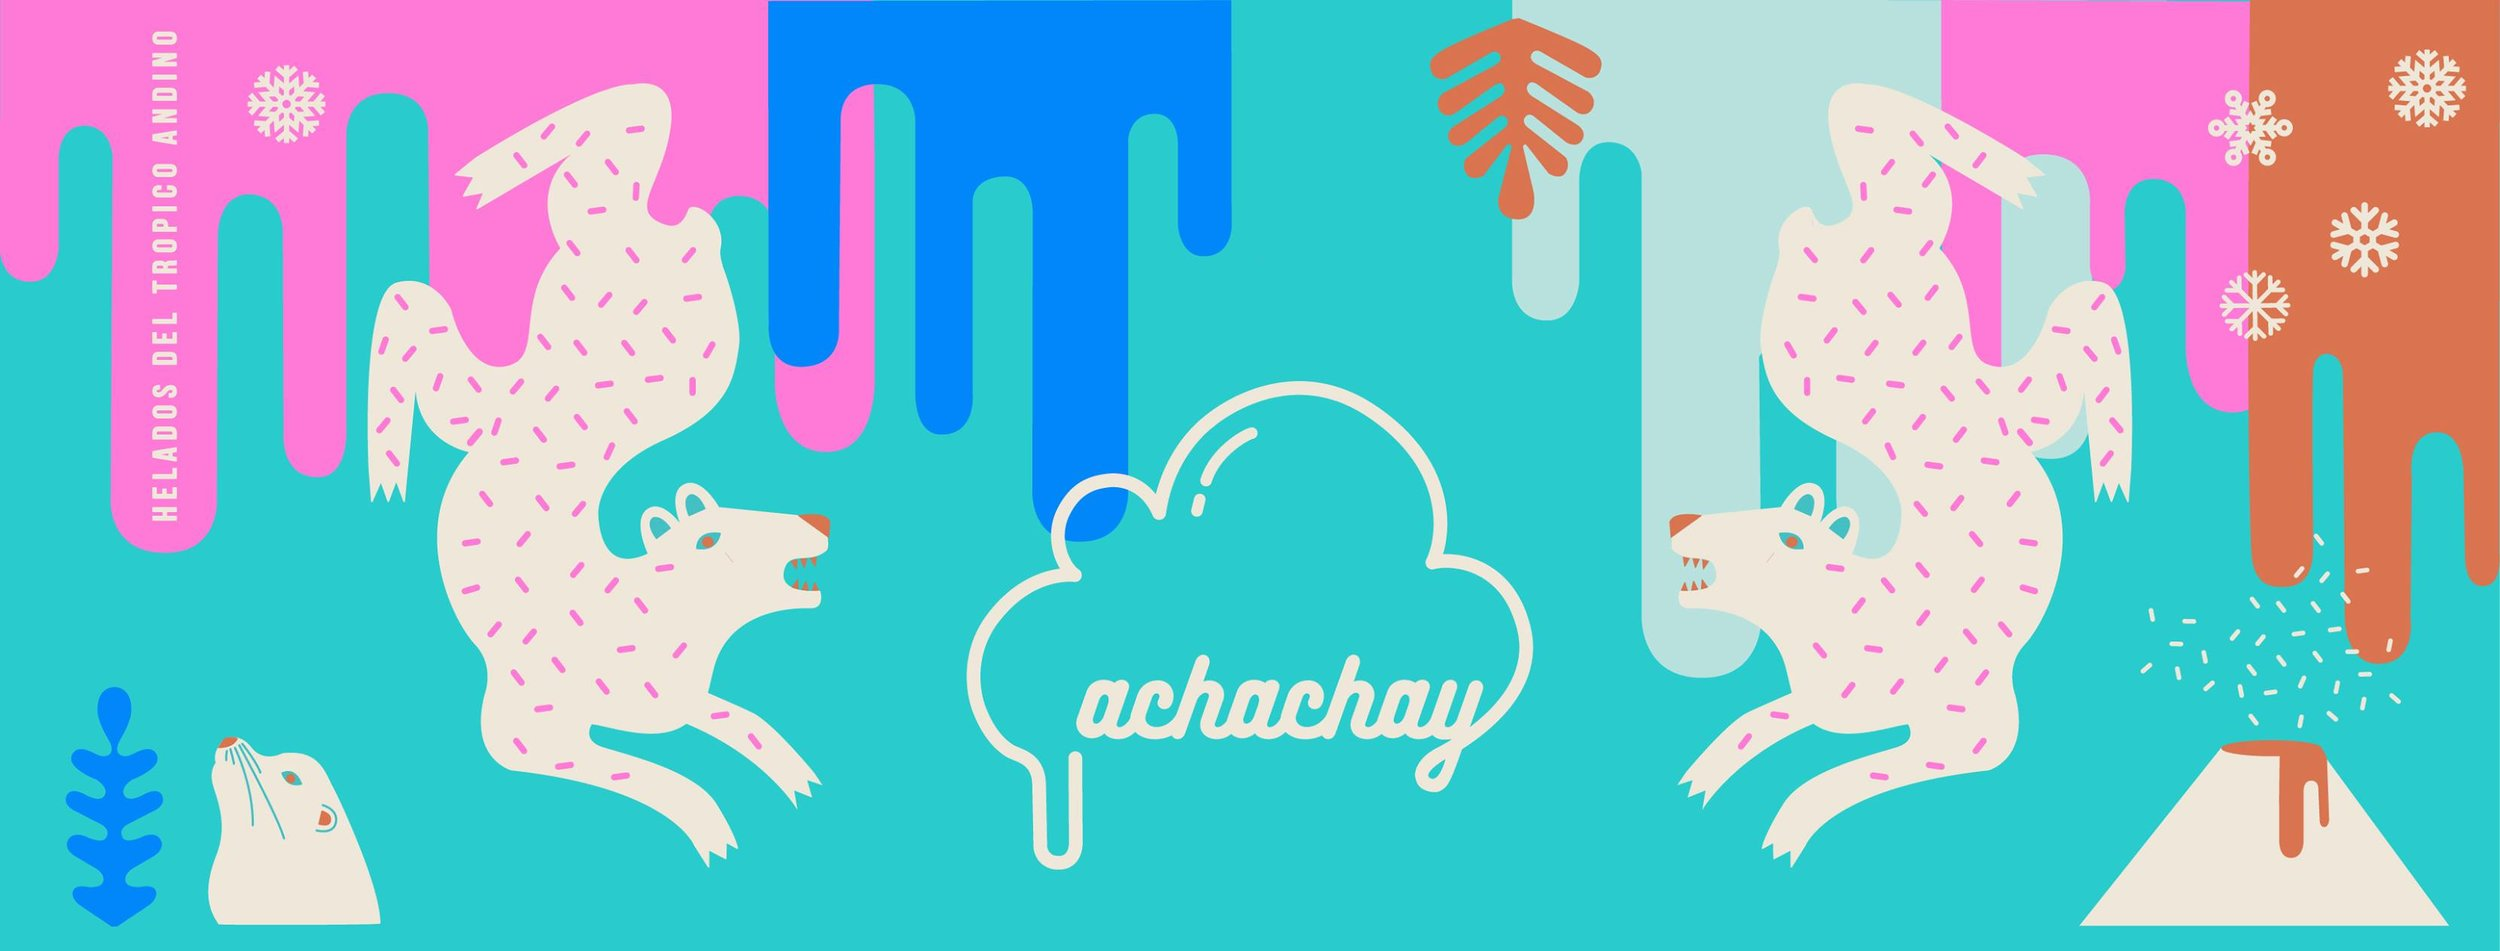 Achachay Heladeria.jpg